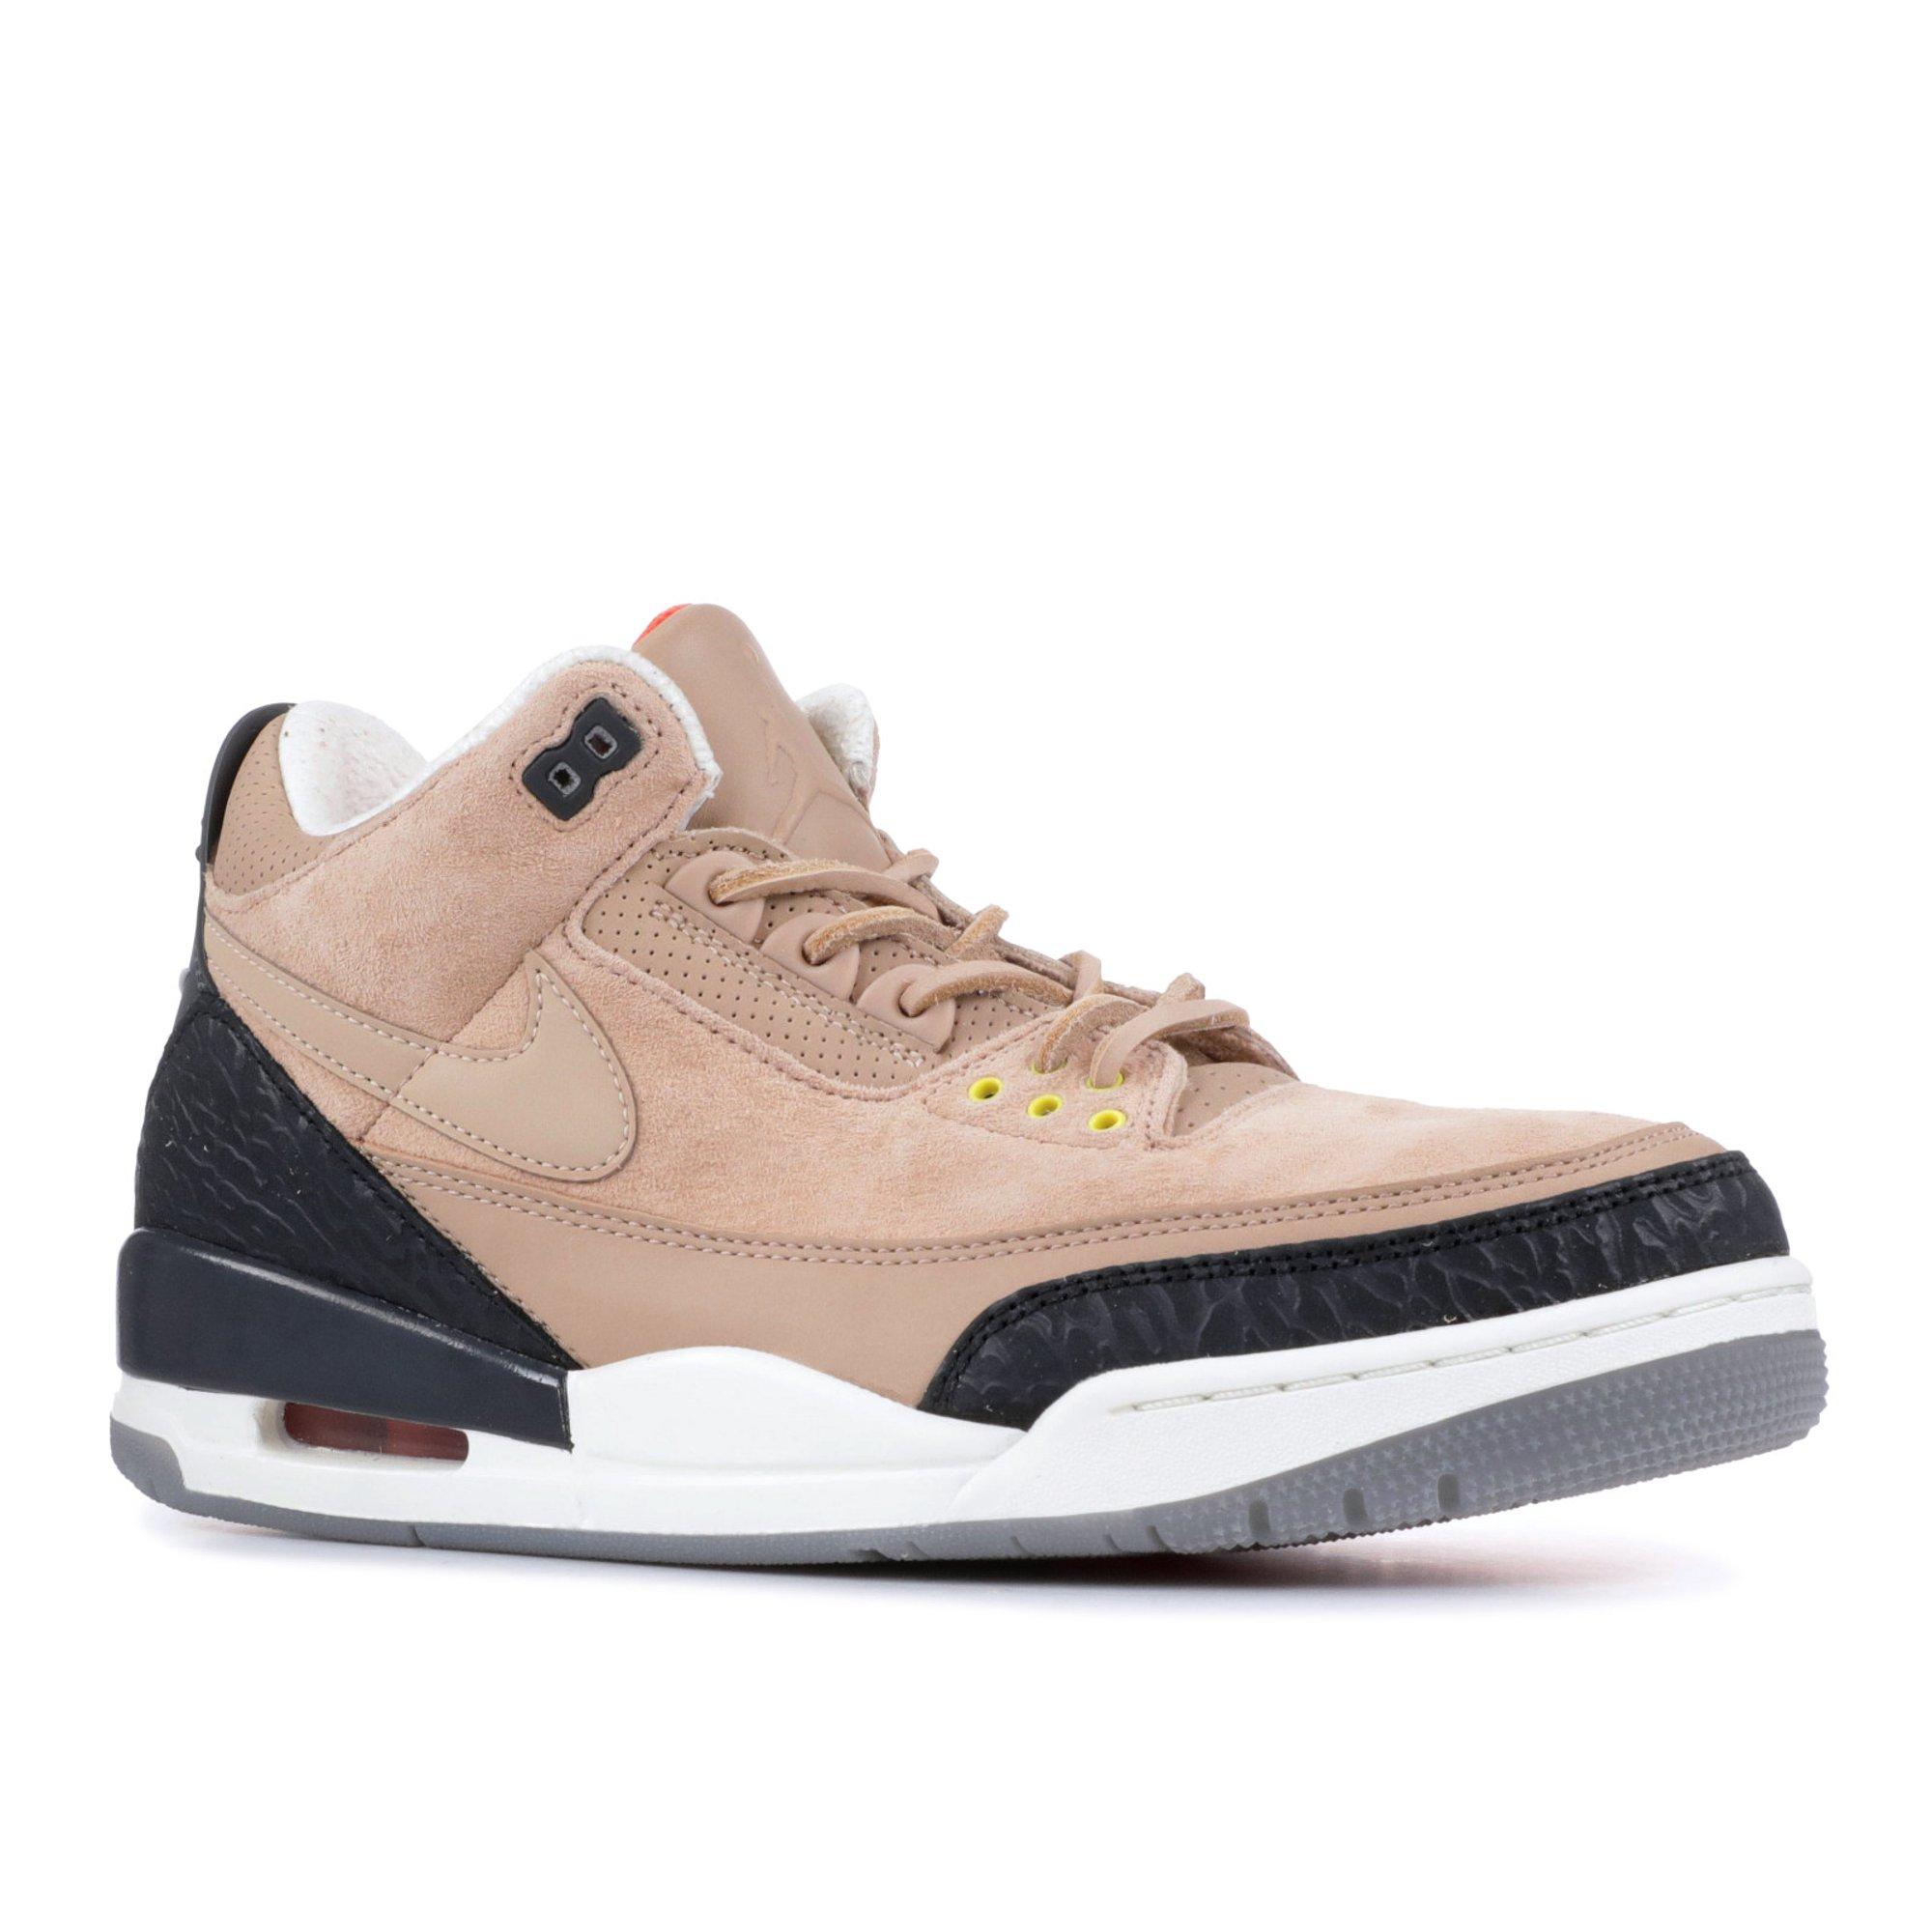 cheap for discount f20dd 918b2 Air Jordan - Men - Air Jordan 3 Jth Nrg 'Bio Beige' - Av6683-200 - Size 11.5